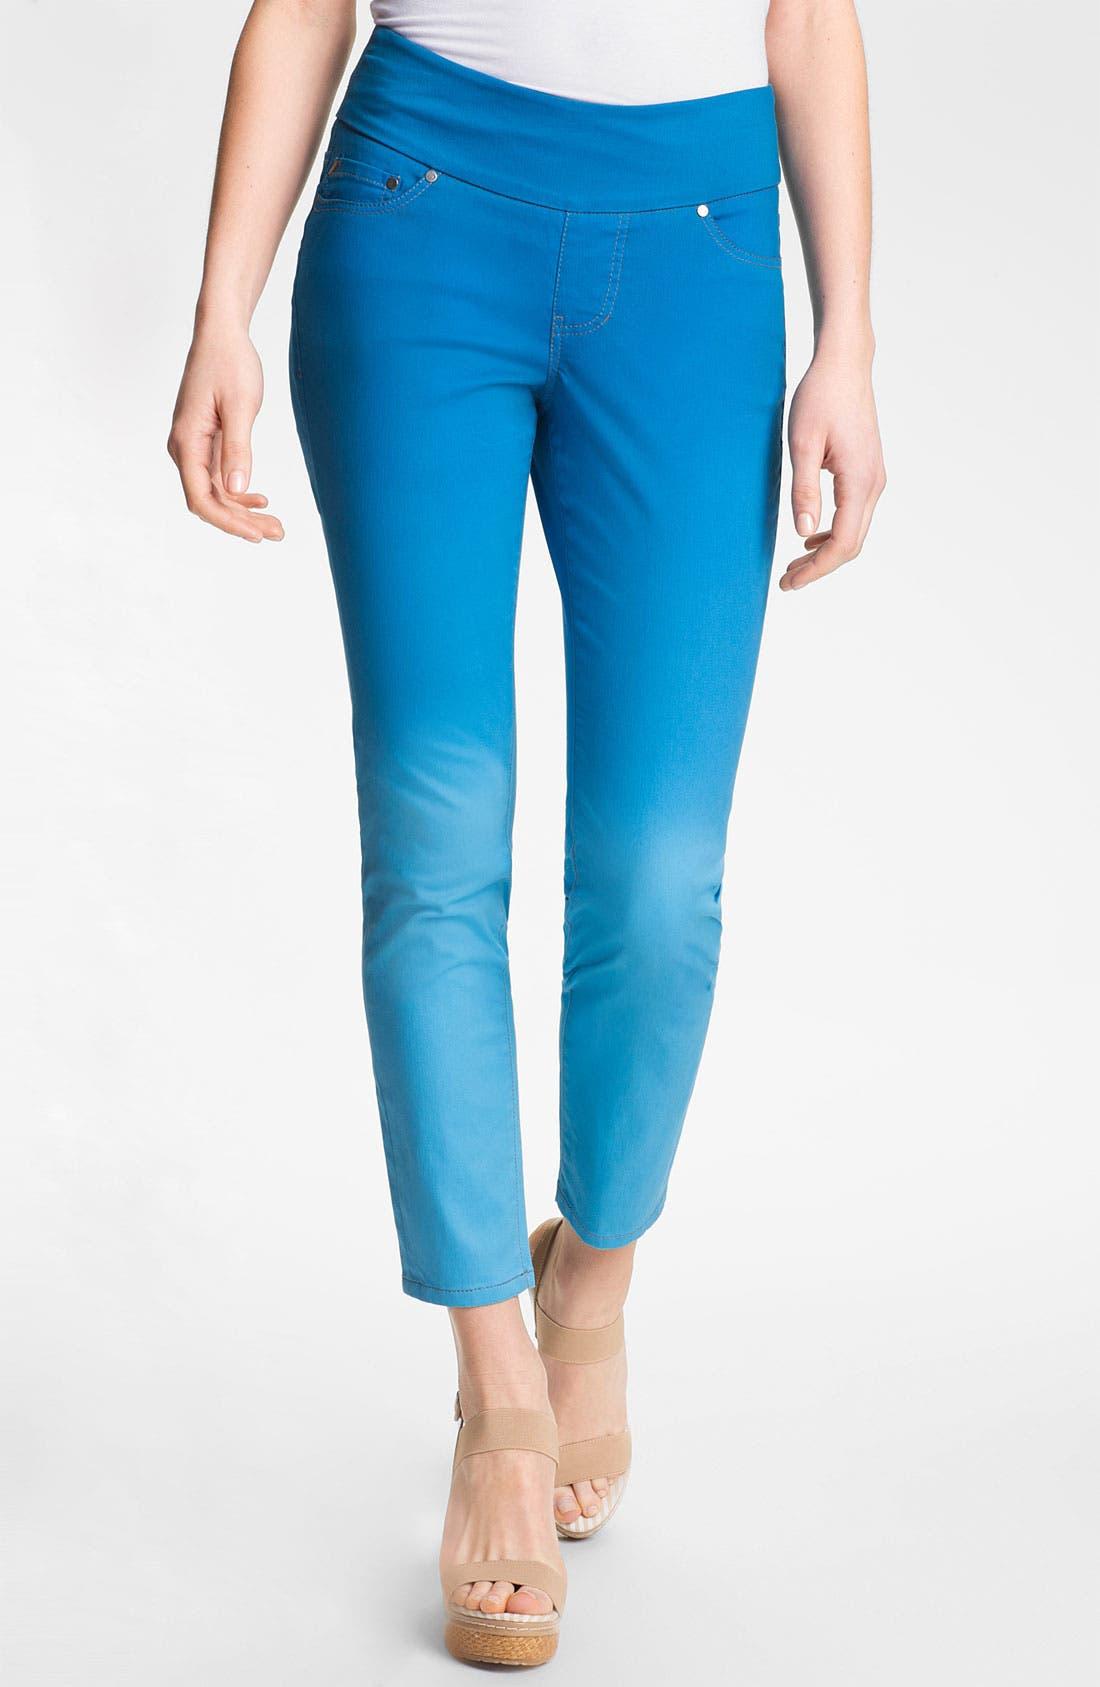 Alternate Image 1 Selected - Jag Jeans 'Amelia' Pull-On Slim Ankle Jeans